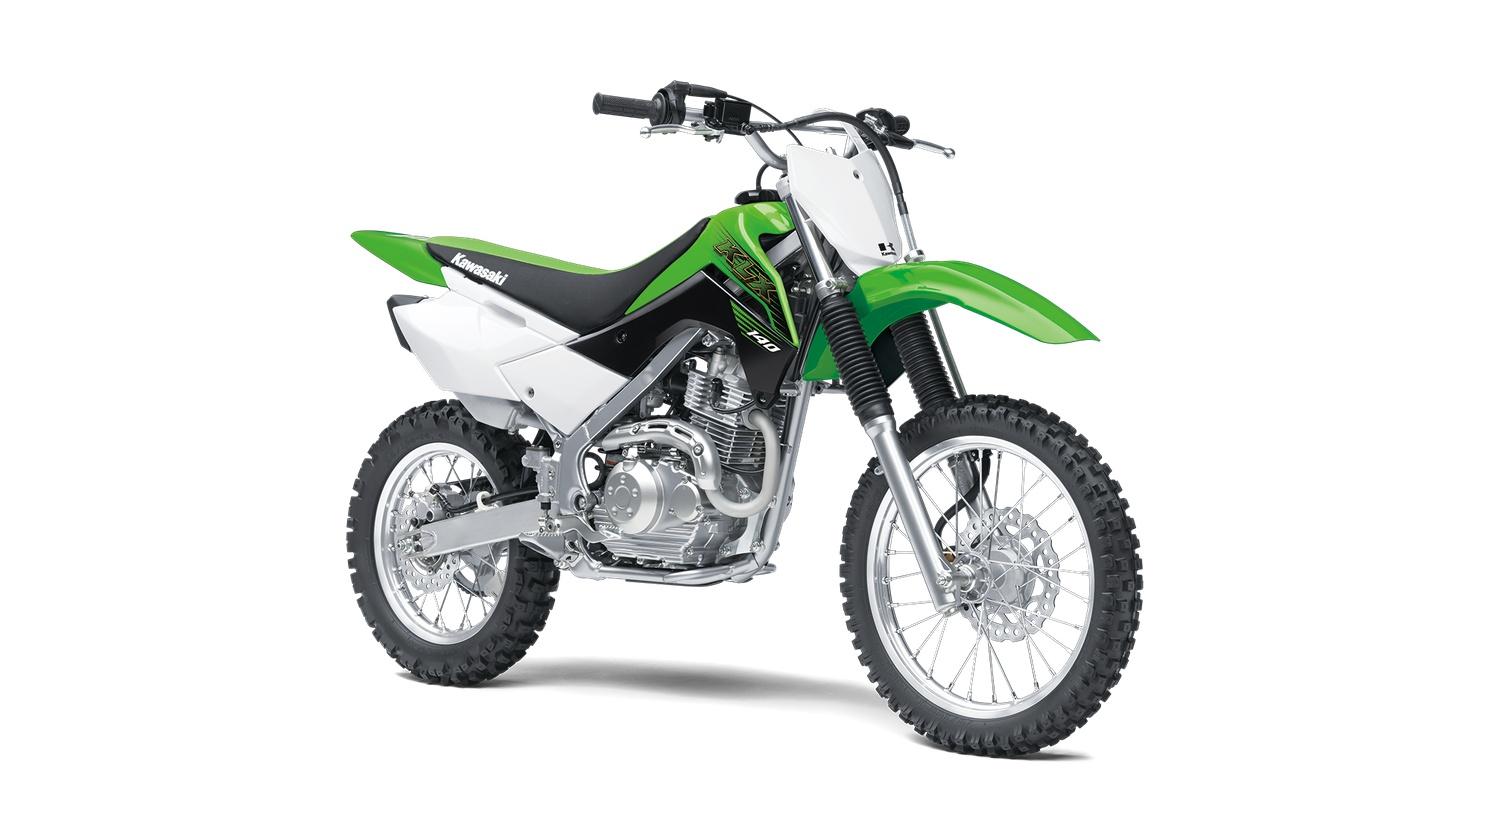 2020 Kawasaki KLX140 Lime Green